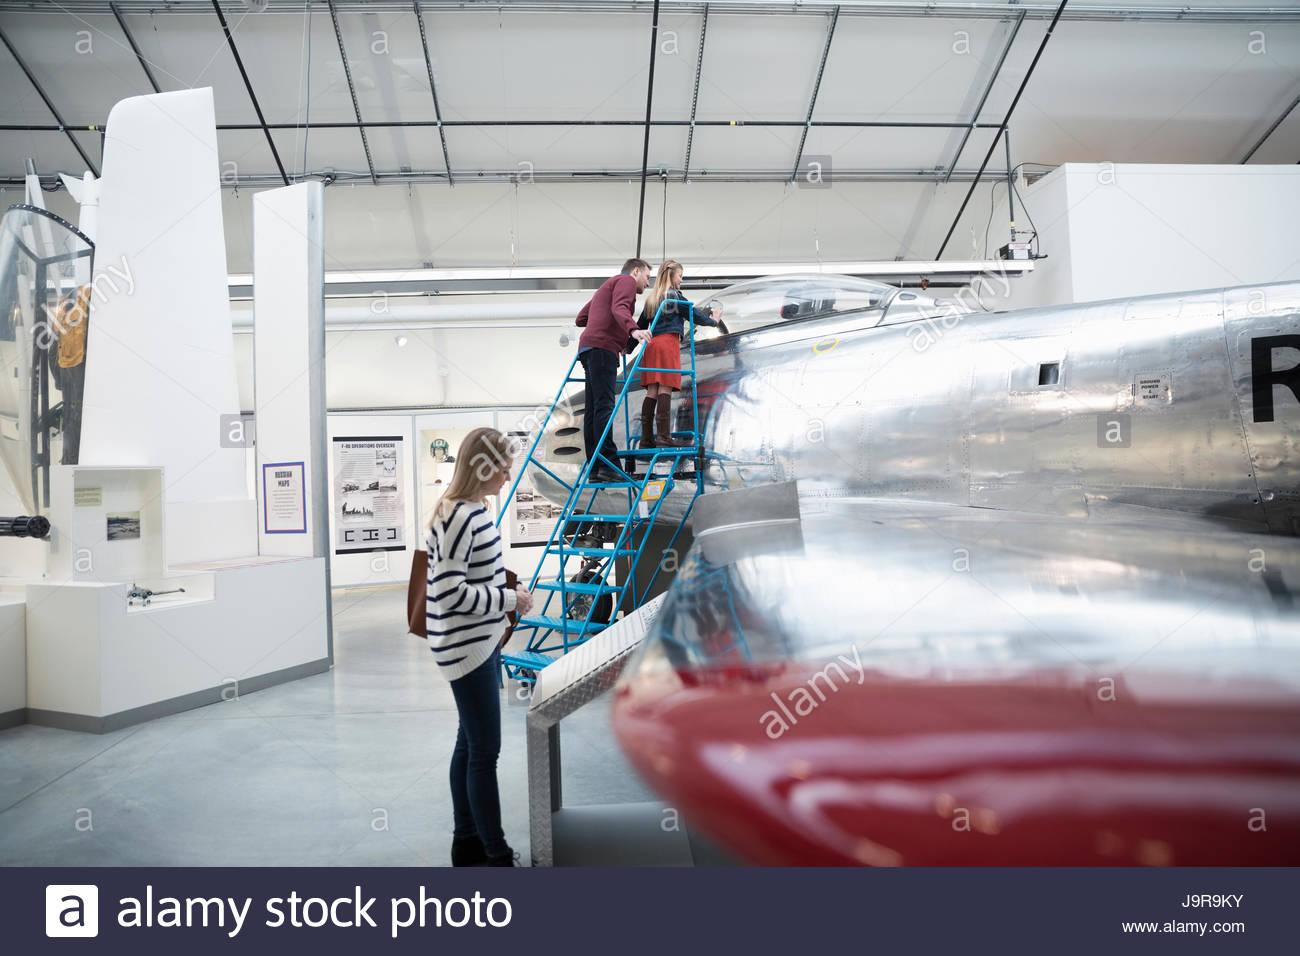 Familie sucht im Flugzeug im Krieg Museum hangar Stockbild